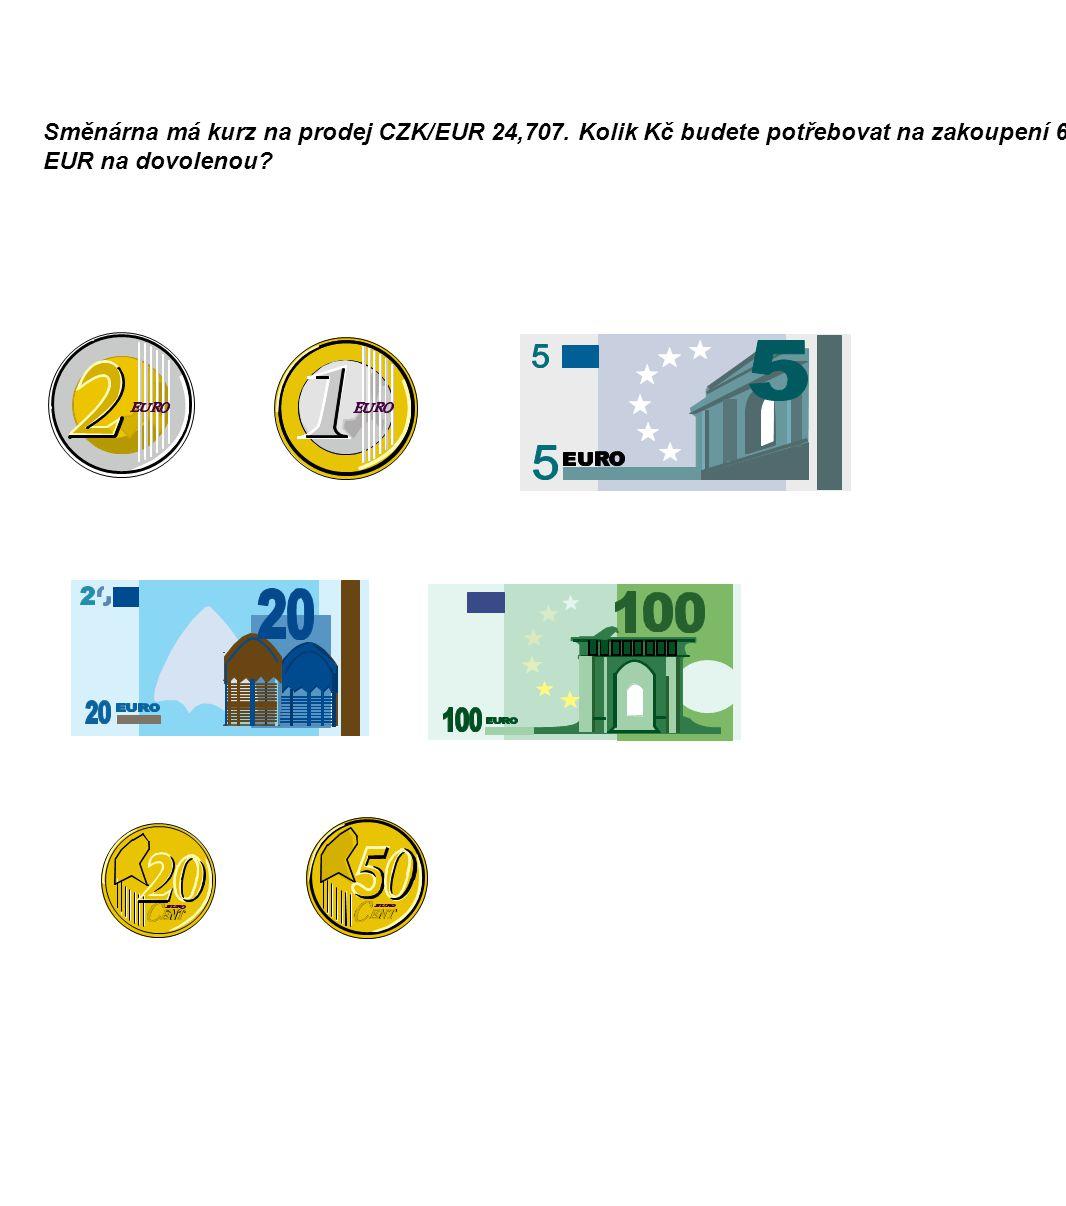 Směnárna má kurz na prodej CZK/EUR 24,707.